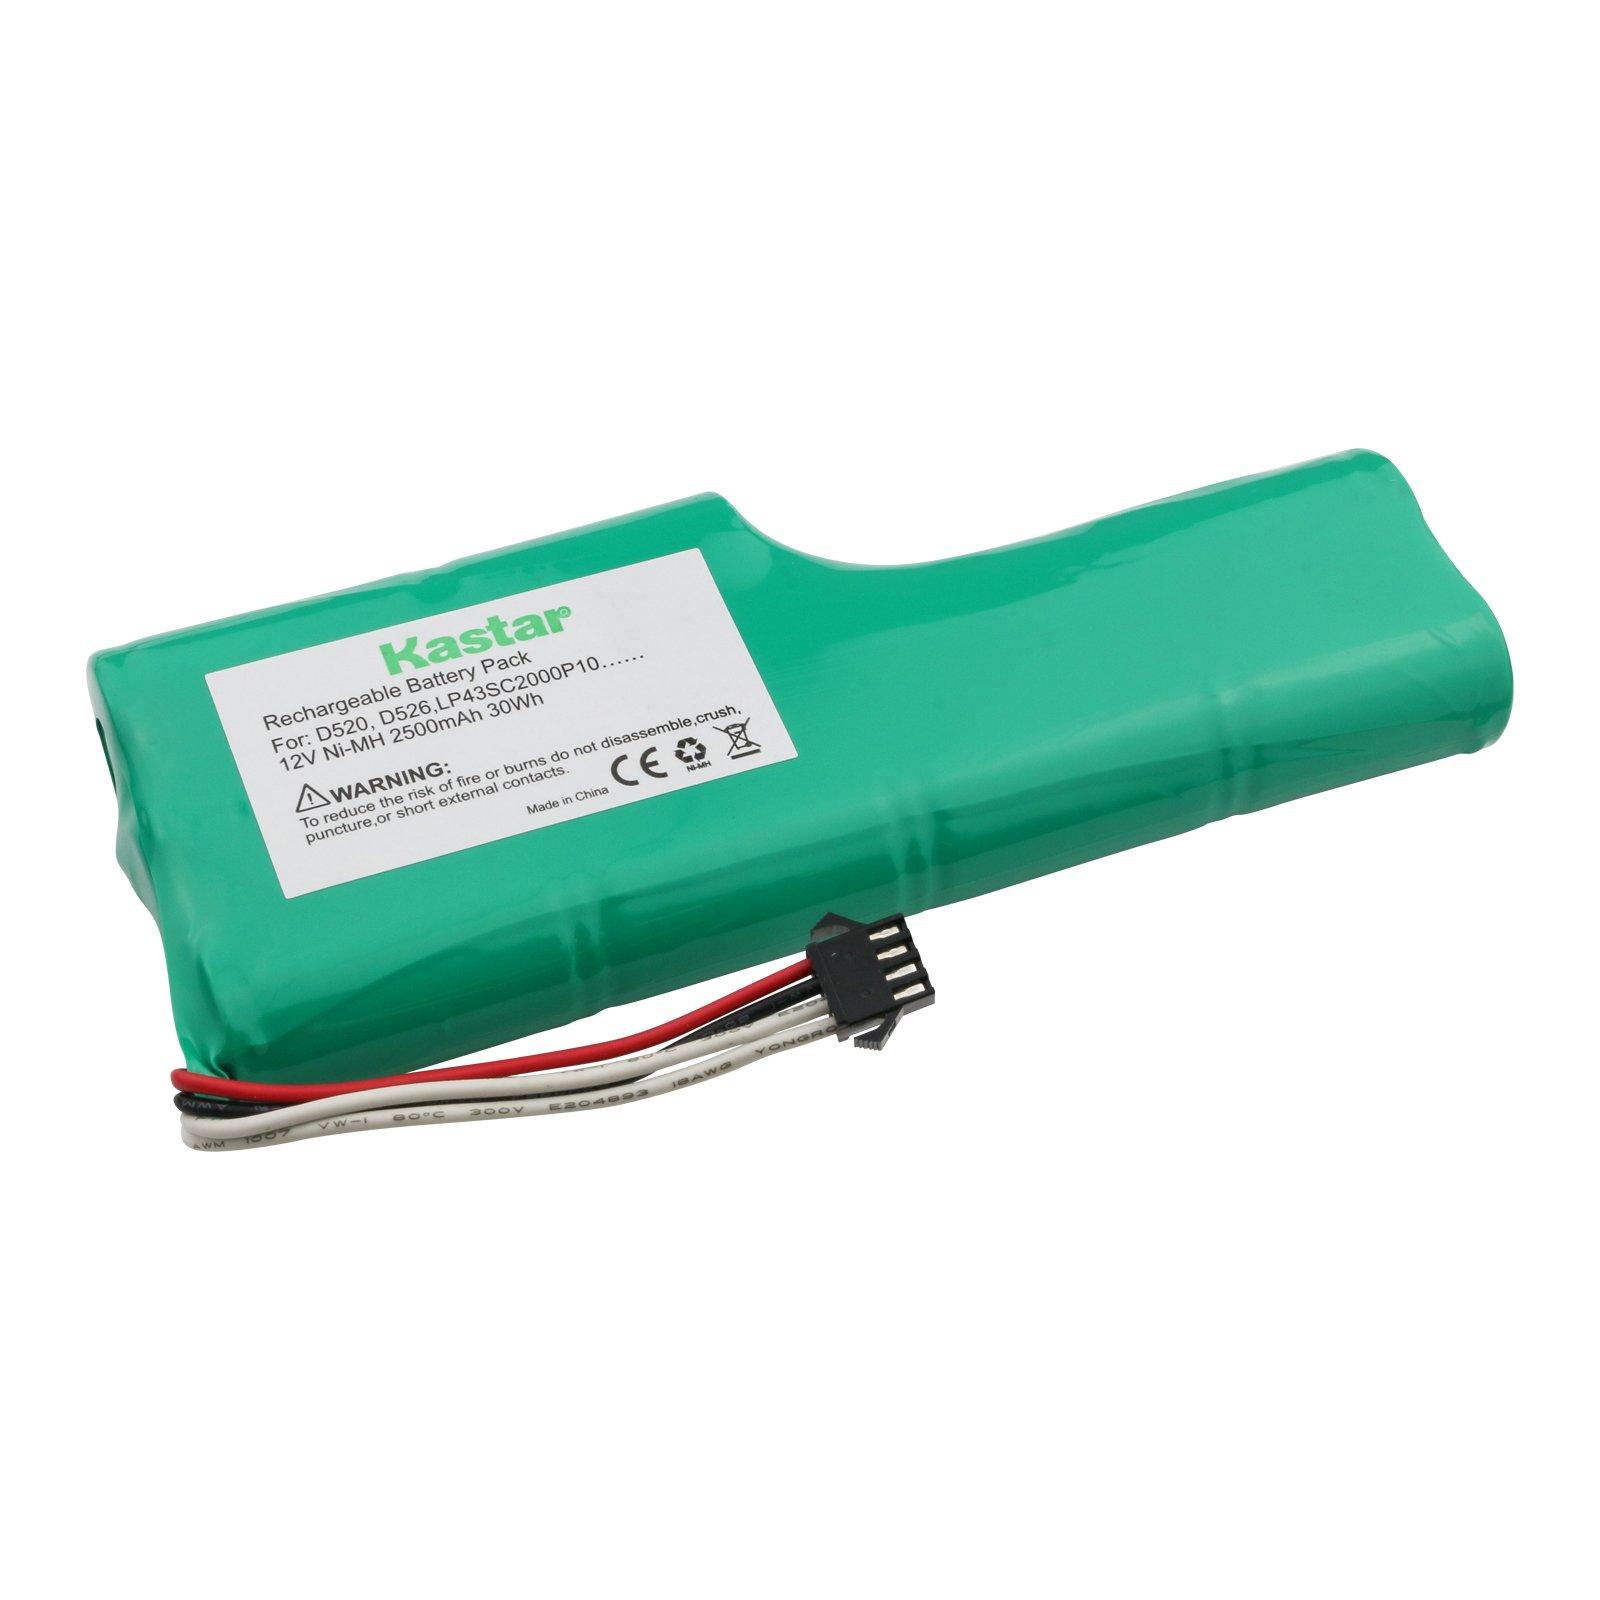 Kastar D520 Battery (1 Pack), Ni-MH 12V 2500mAh, Replacement for ECOVACS Deebot D520, Deebot D526, LP43SC2000P10